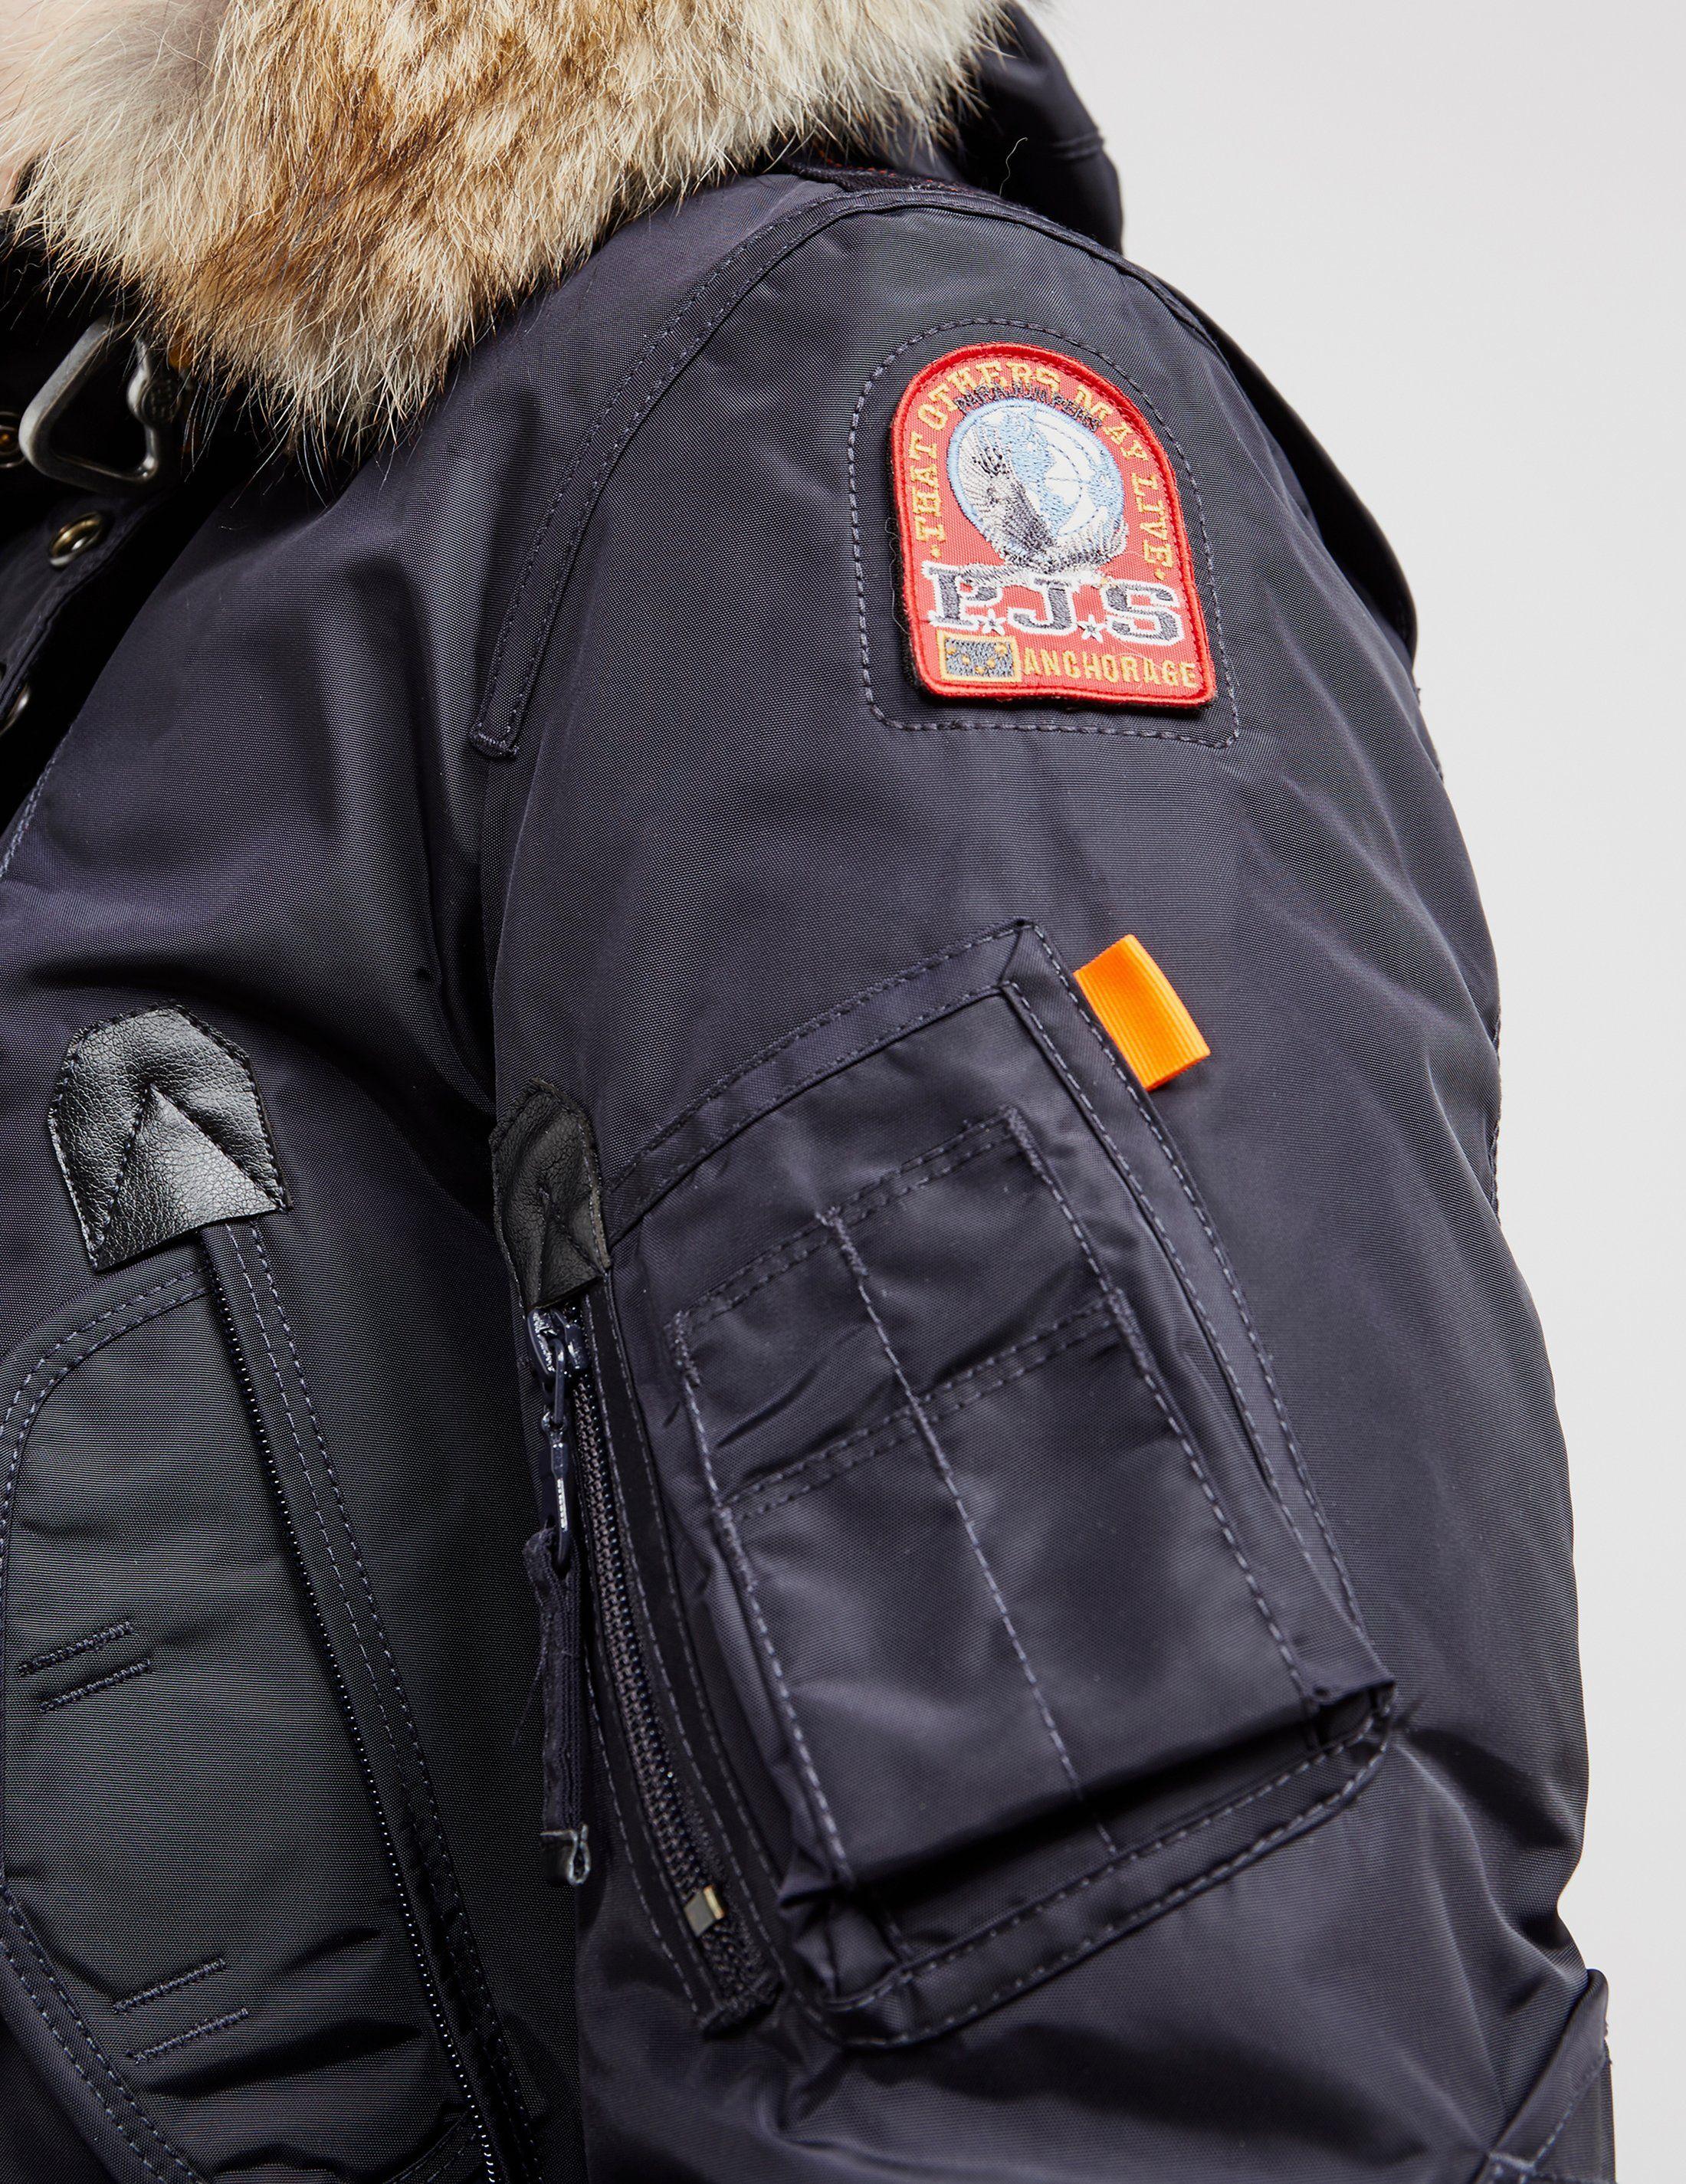 Parajumpers Rhand Padded Parka Jacket